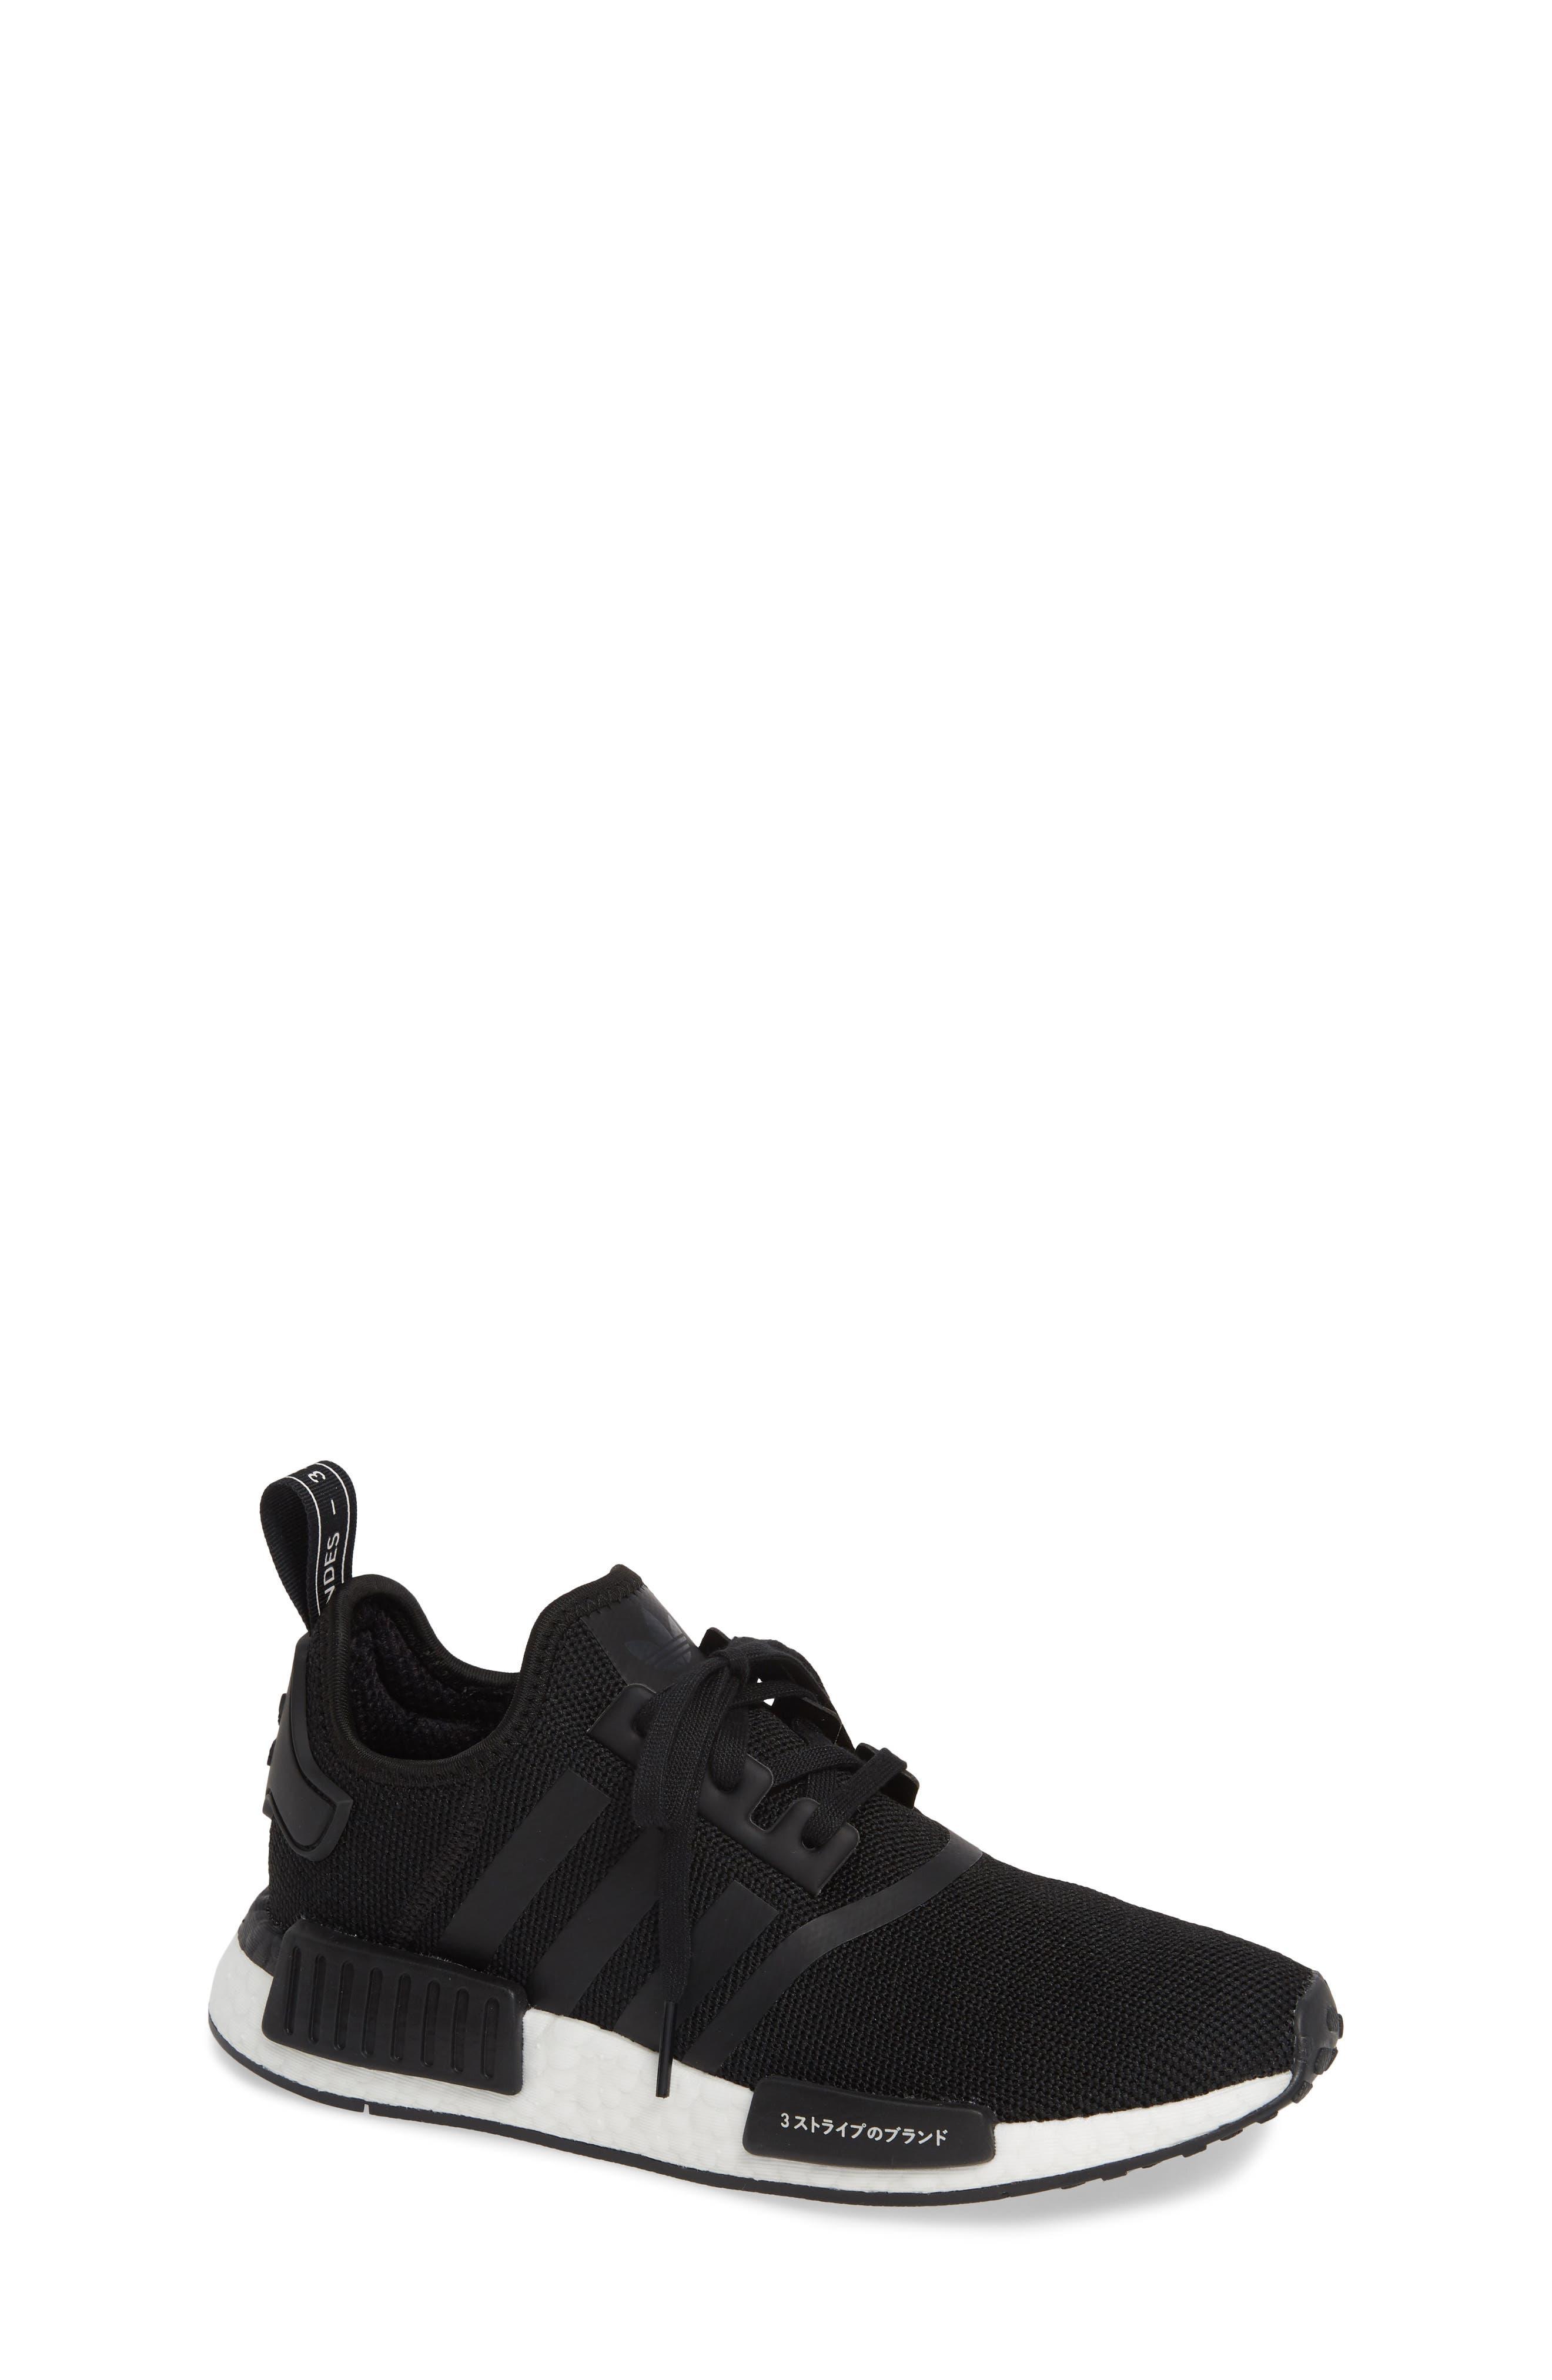 ADIDAS, NMD R1 Sneaker, Main thumbnail 1, color, CORE BLACK/ BLACK/ ORCHID TINT